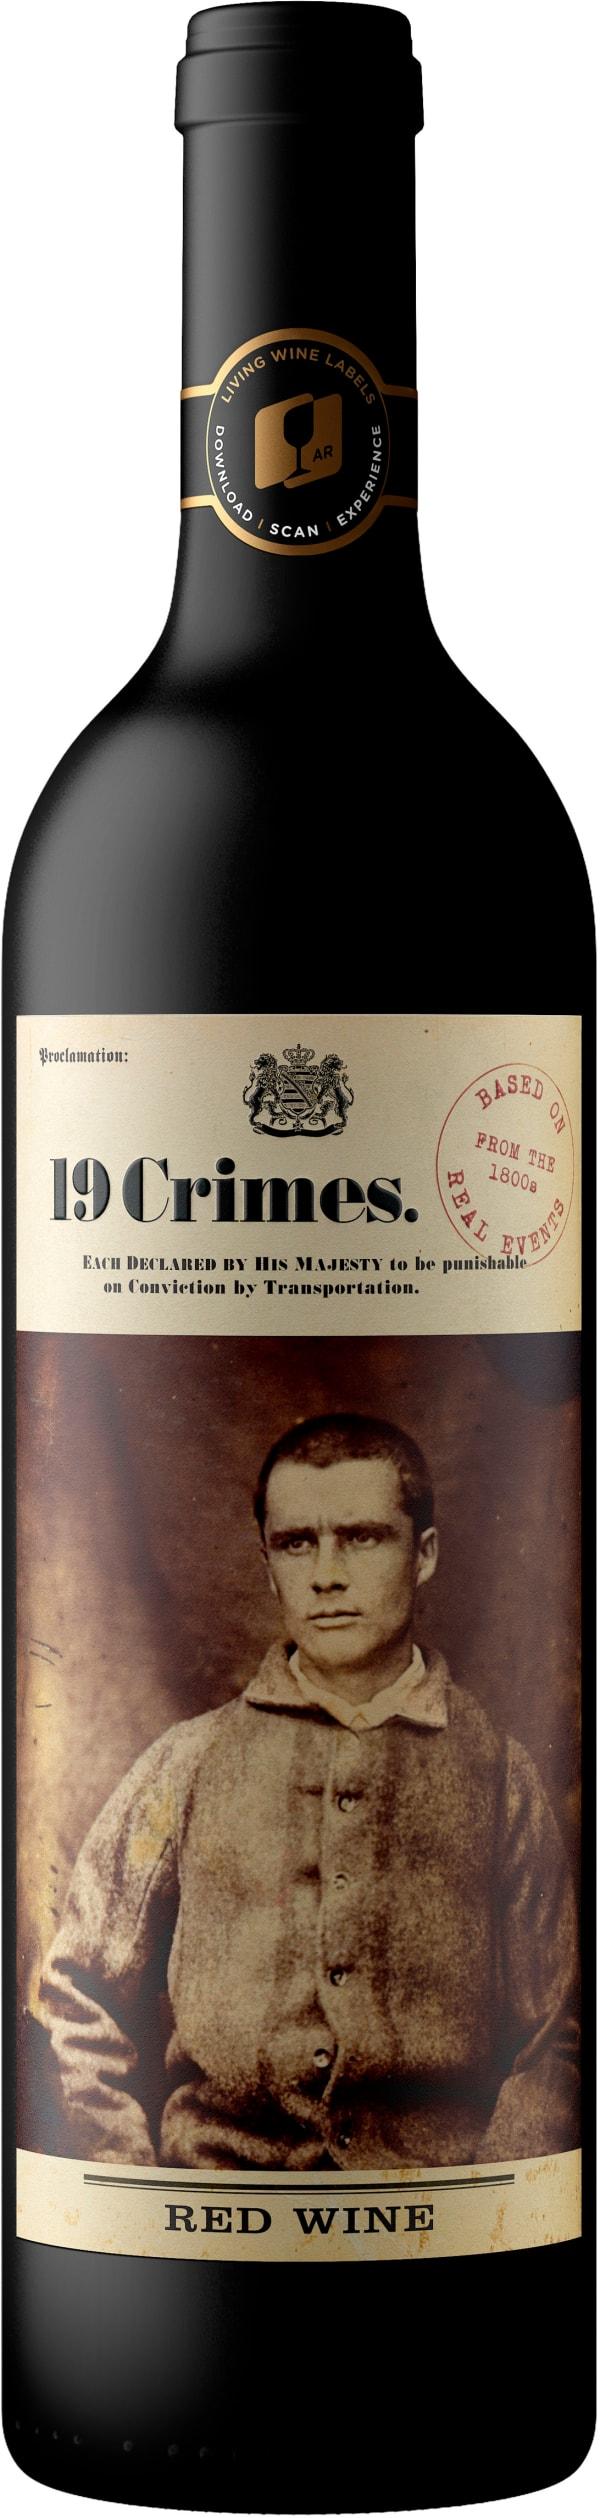 19 Crimes Red wine 2019